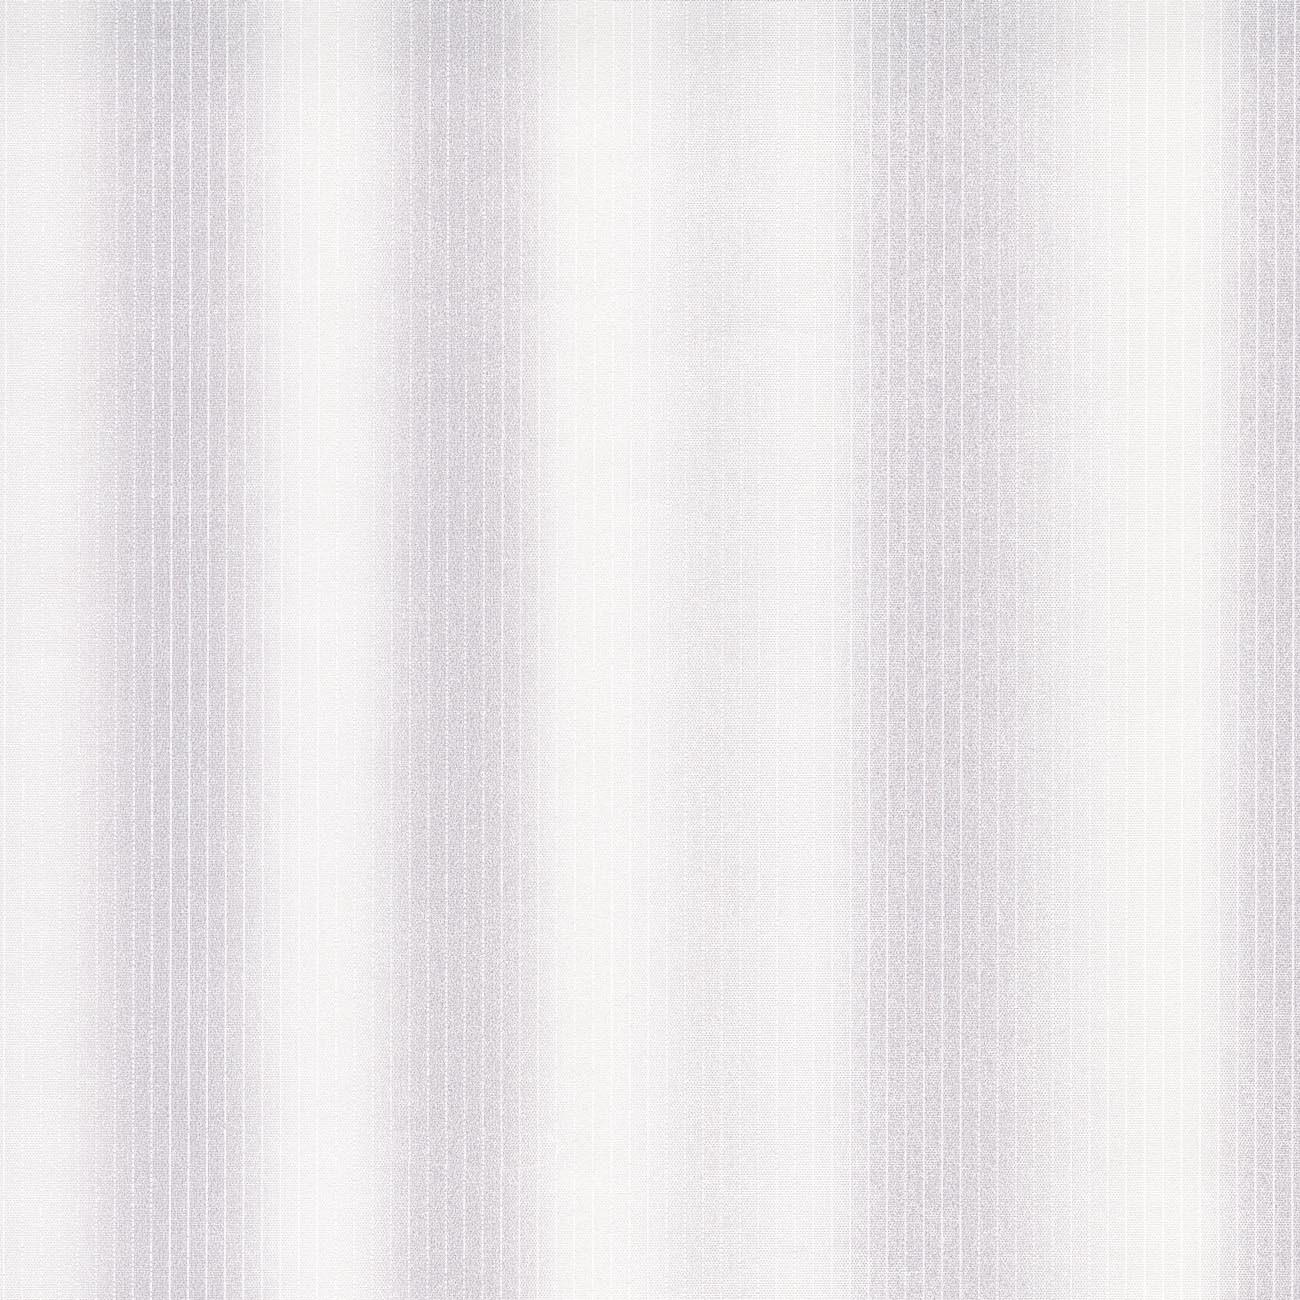 wandpaneele holzoptik tapeten shop. Black Bedroom Furniture Sets. Home Design Ideas